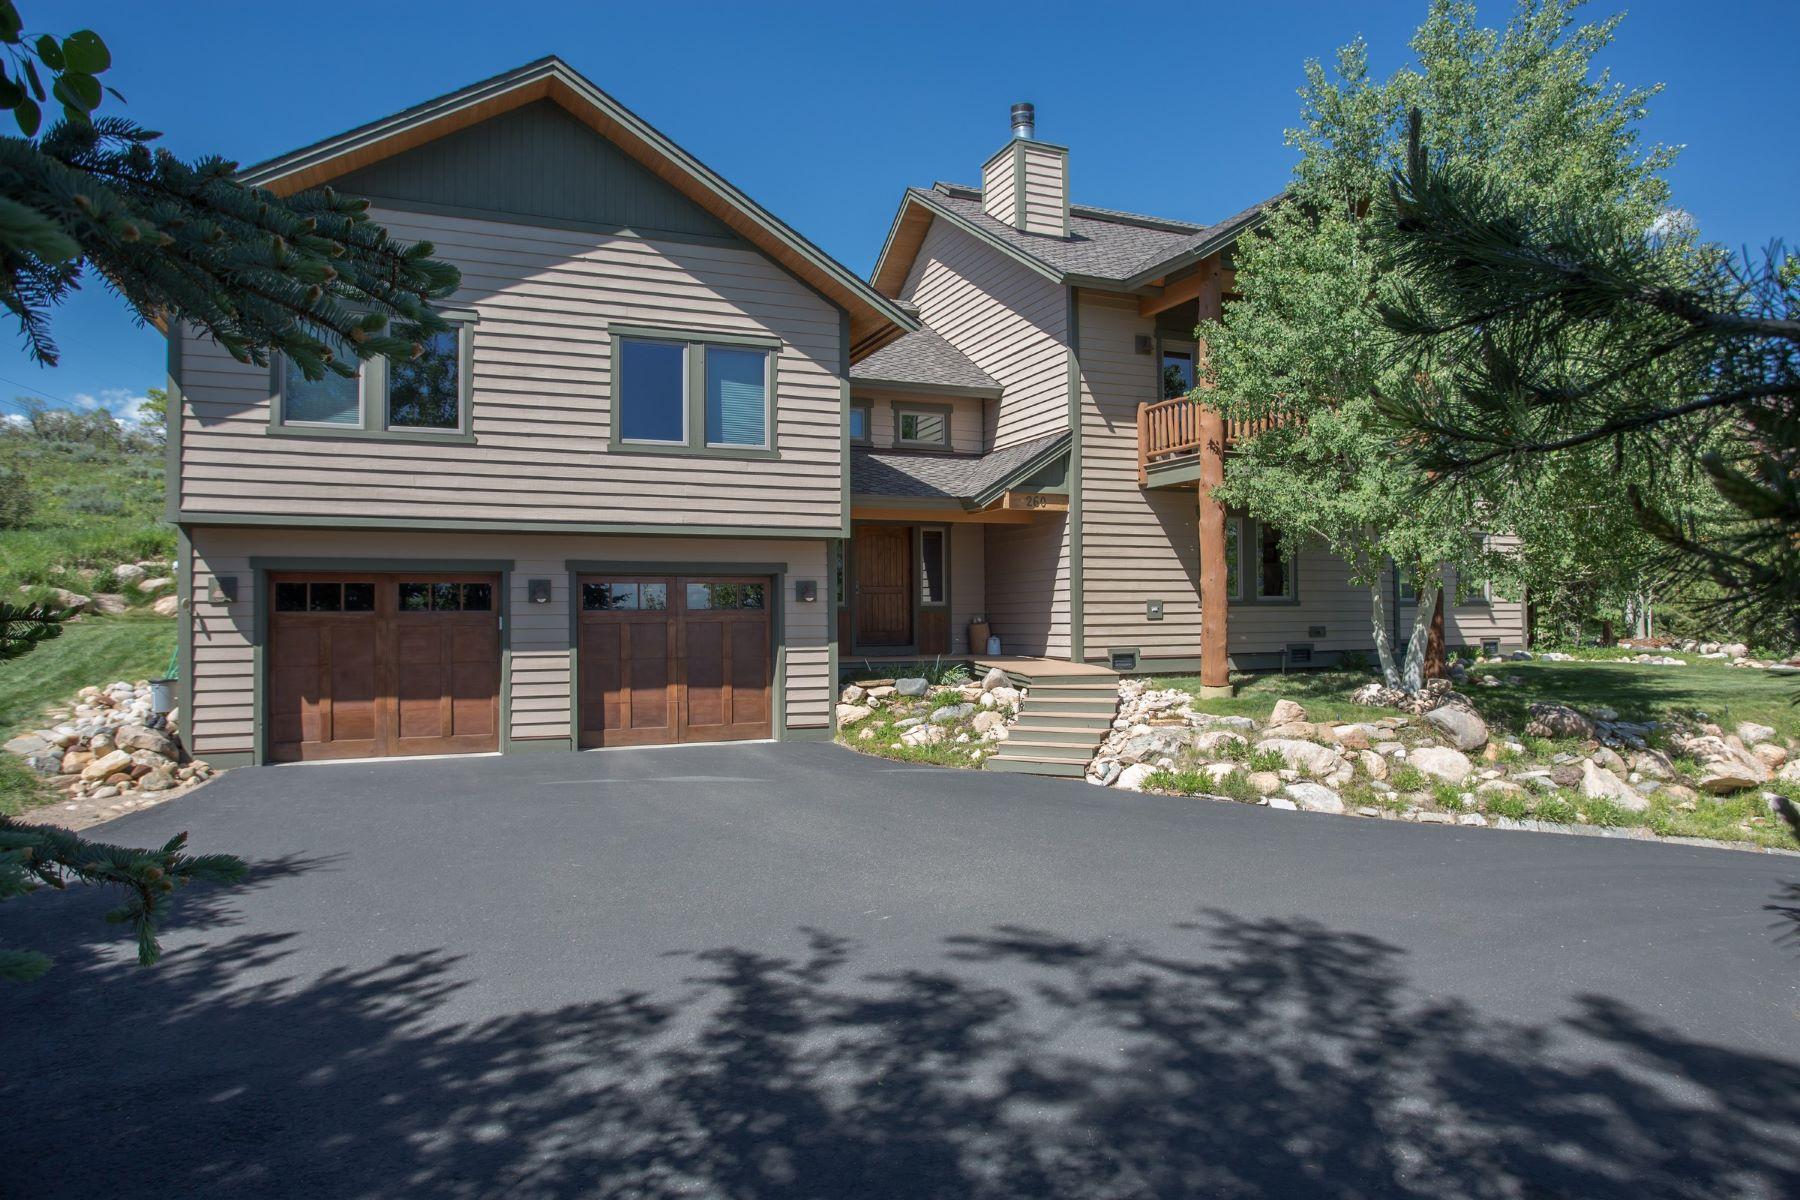 独户住宅 为 出租 在 5 Bedroom Luxury Home in Fish Creek Falls 260 Storm Peak Ct 斯廷博特斯普林斯, 科罗拉多州 80487 美国